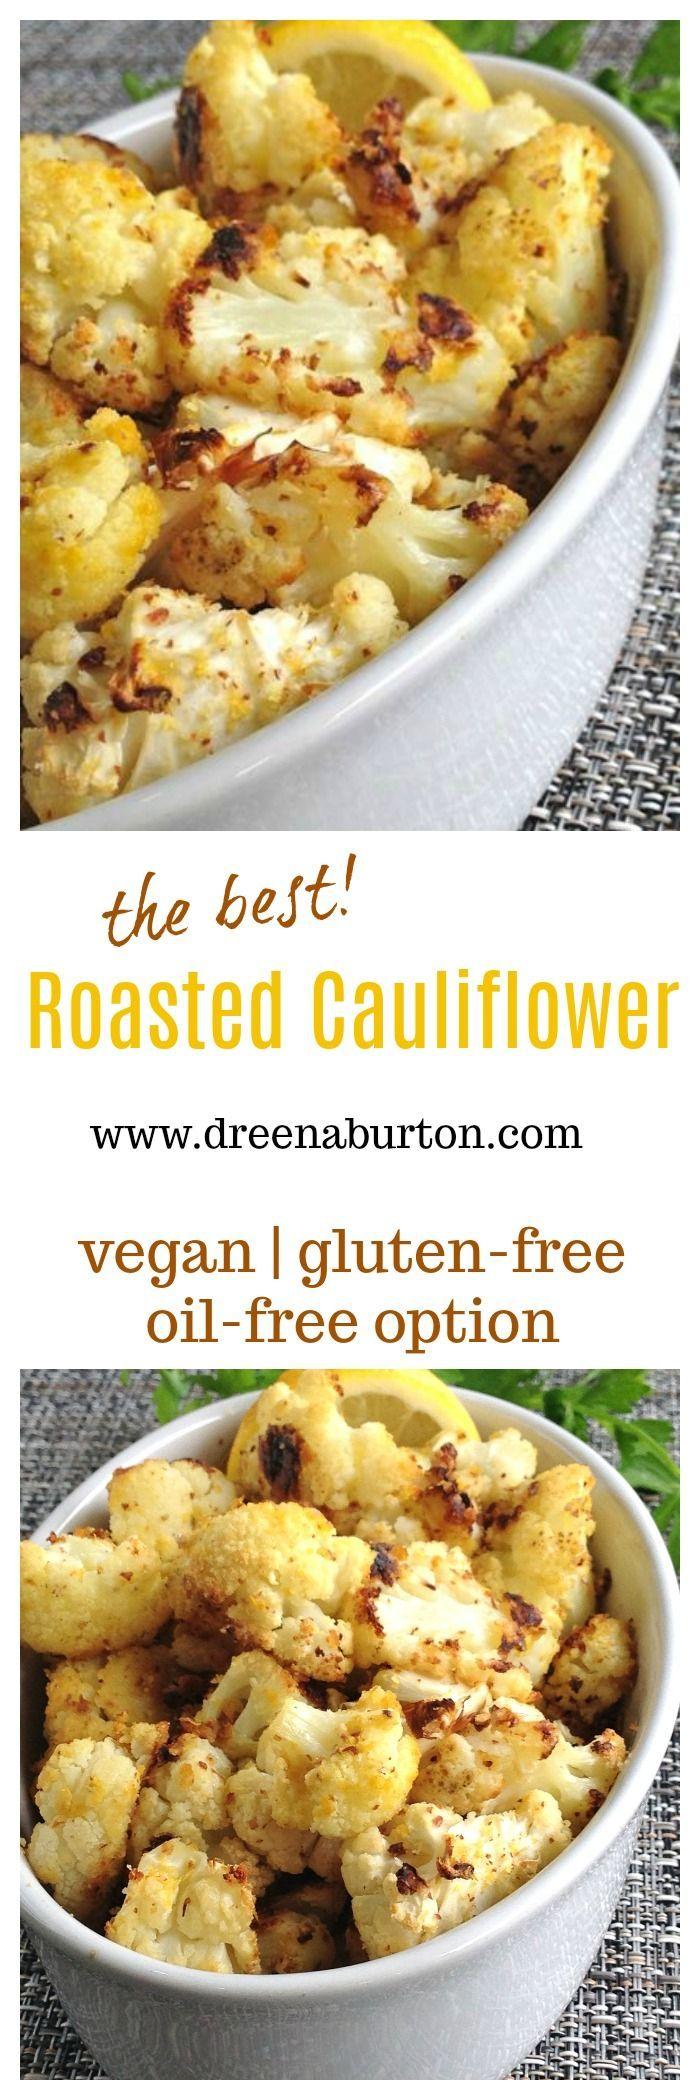 This ALMOND ROASTED CAULIFLOWER will turn cauliflower haters into cauli lovers! #vegan #glutenfree